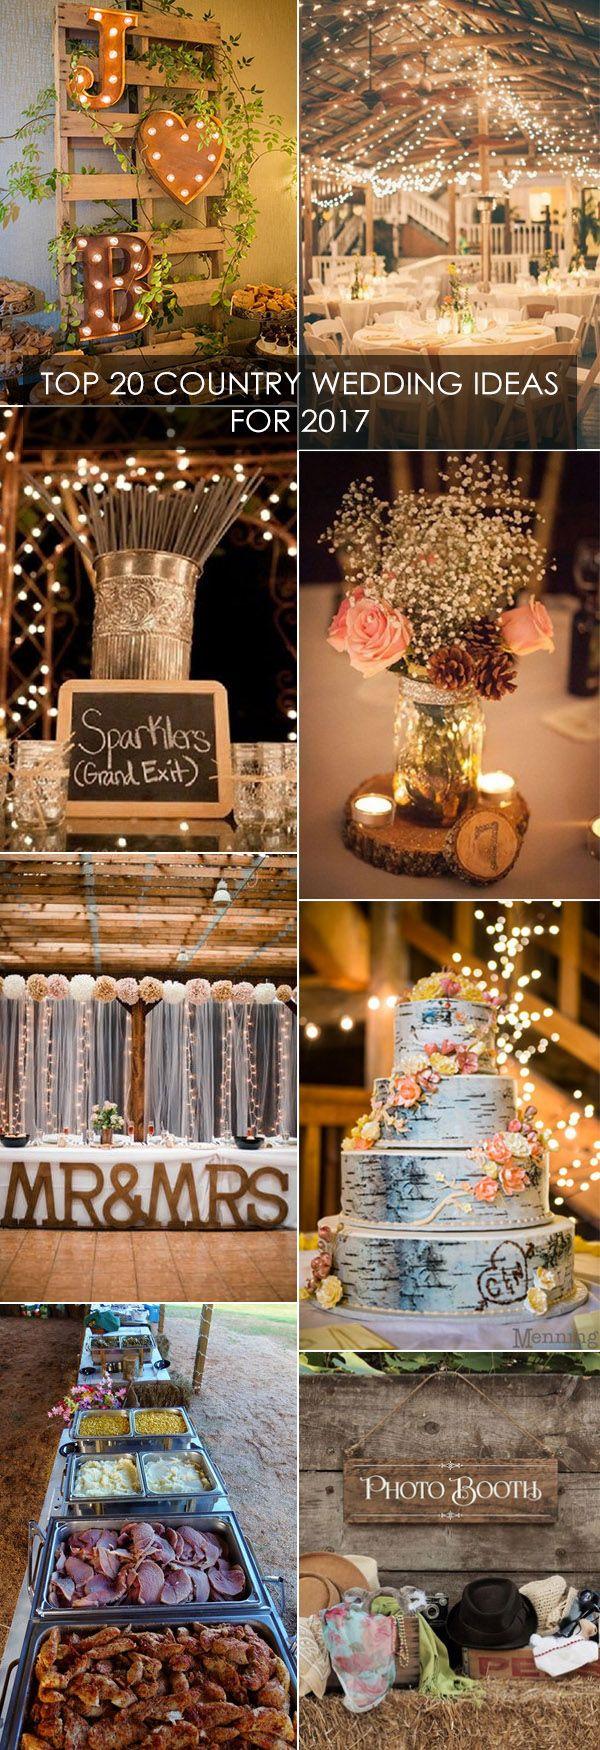 Wedding decorations country december 2018  best Wedding ideas images on Pinterest  Wedding ideas Rustic